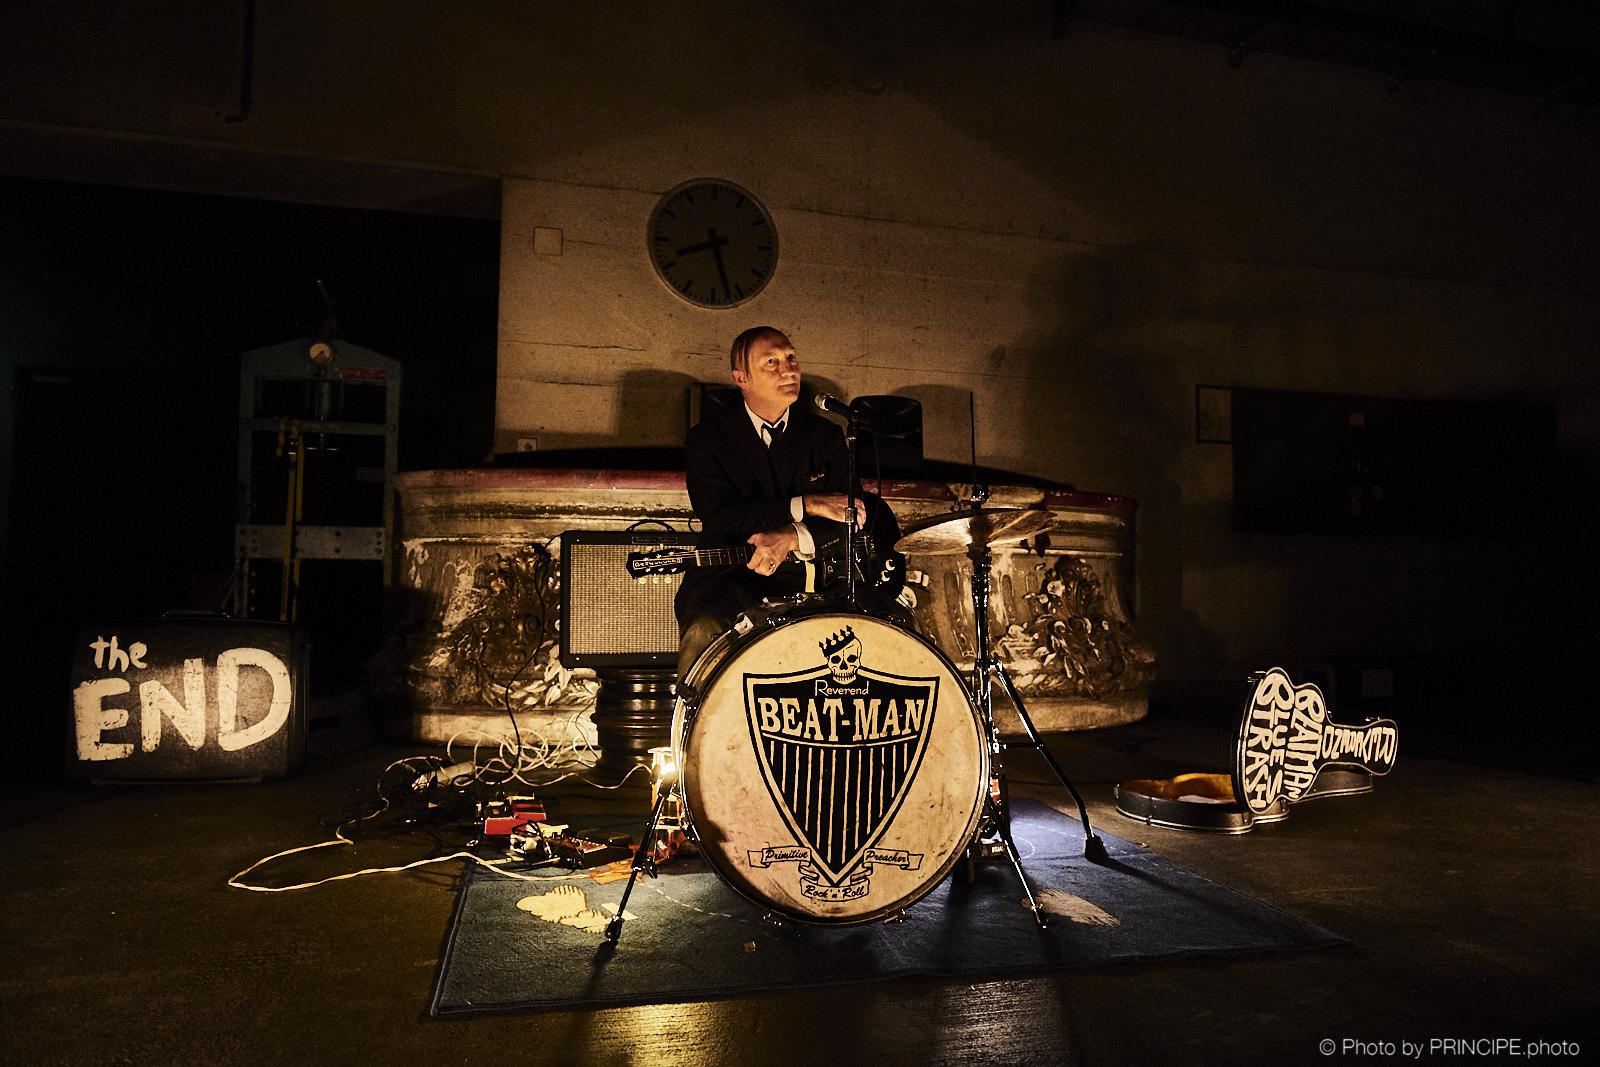 Reverend Beat-Man @ Winterkrieg im Galgenfeld